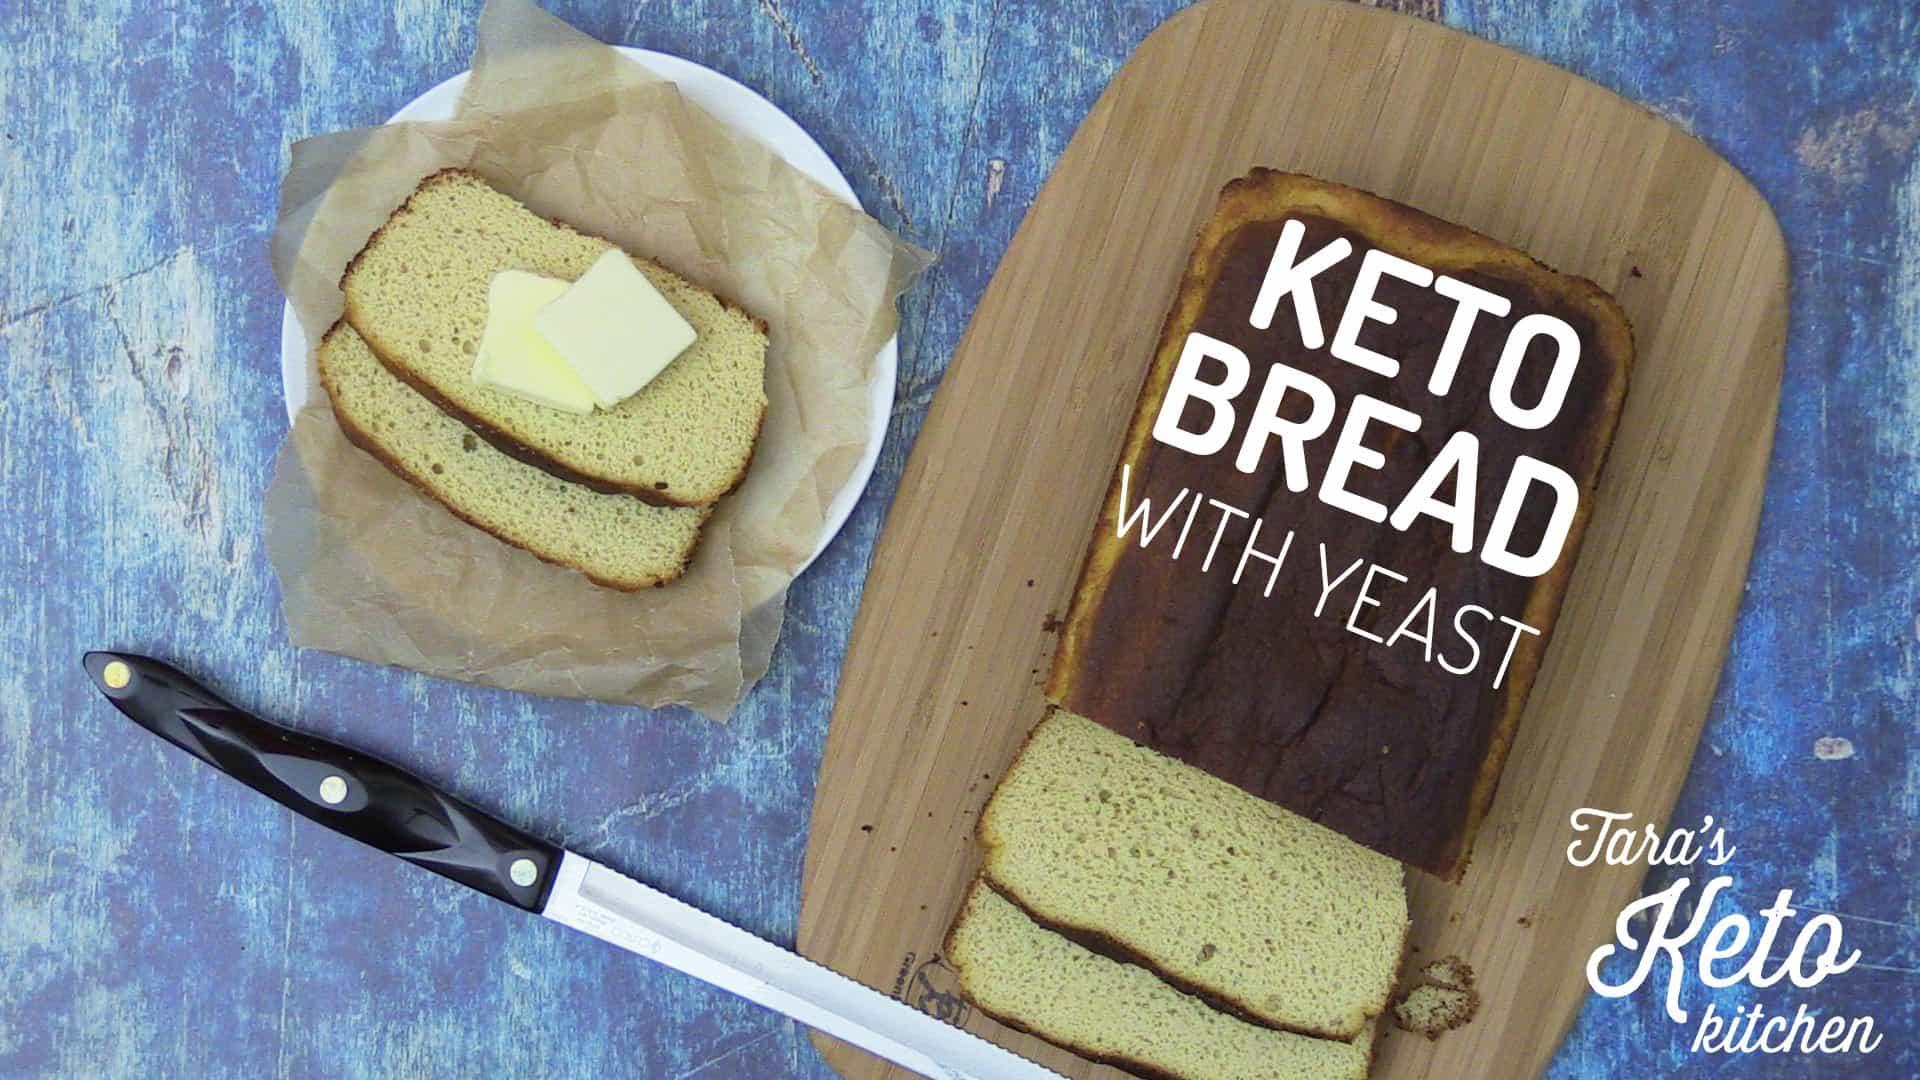 keto yeast bread